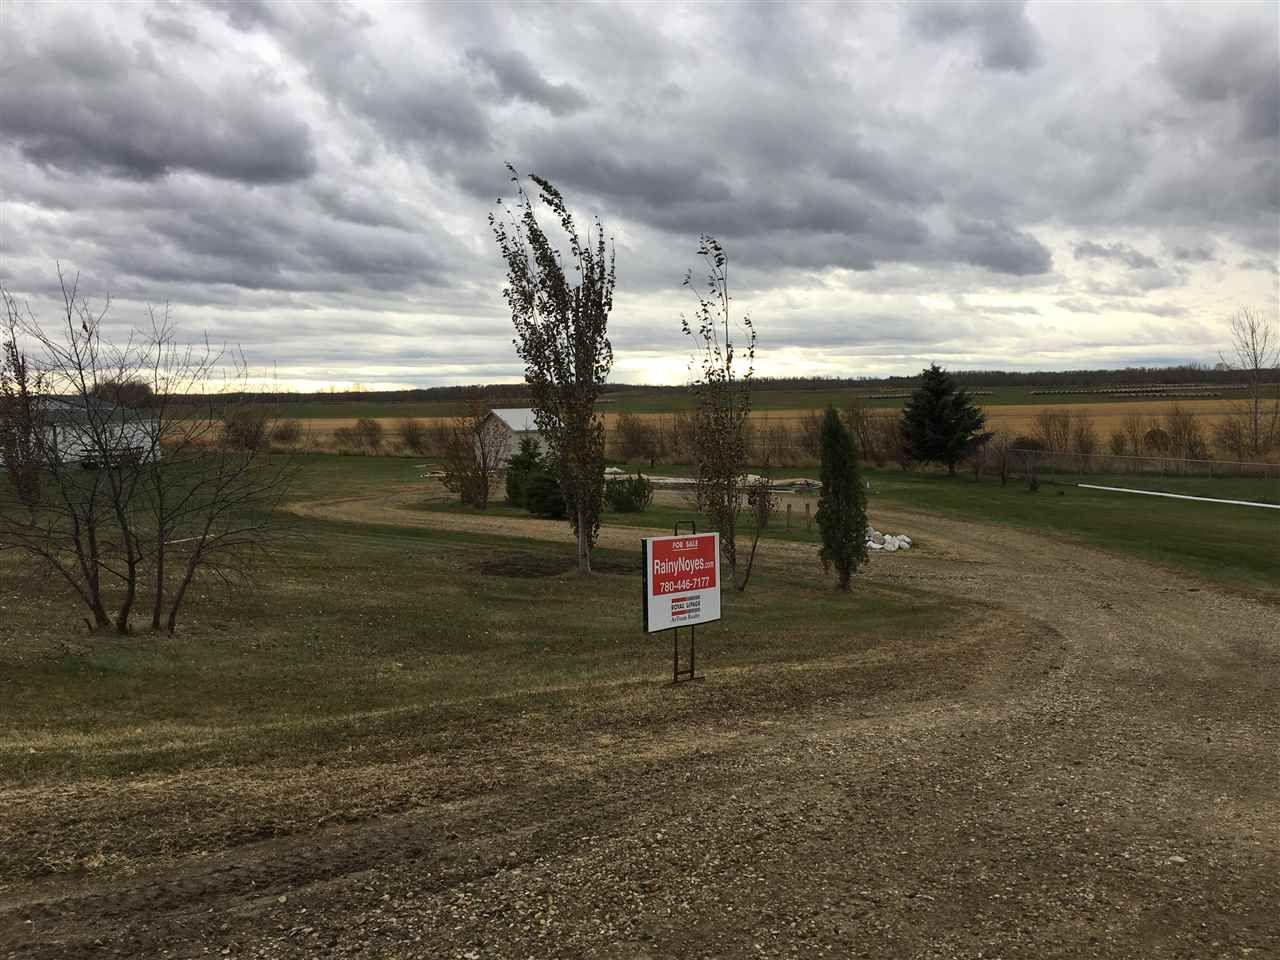 Main Photo: 107 3510 Ste. Anne Trail: Rural Lac Ste. Anne County Rural Land/Vacant Lot for sale : MLS®# E4217820